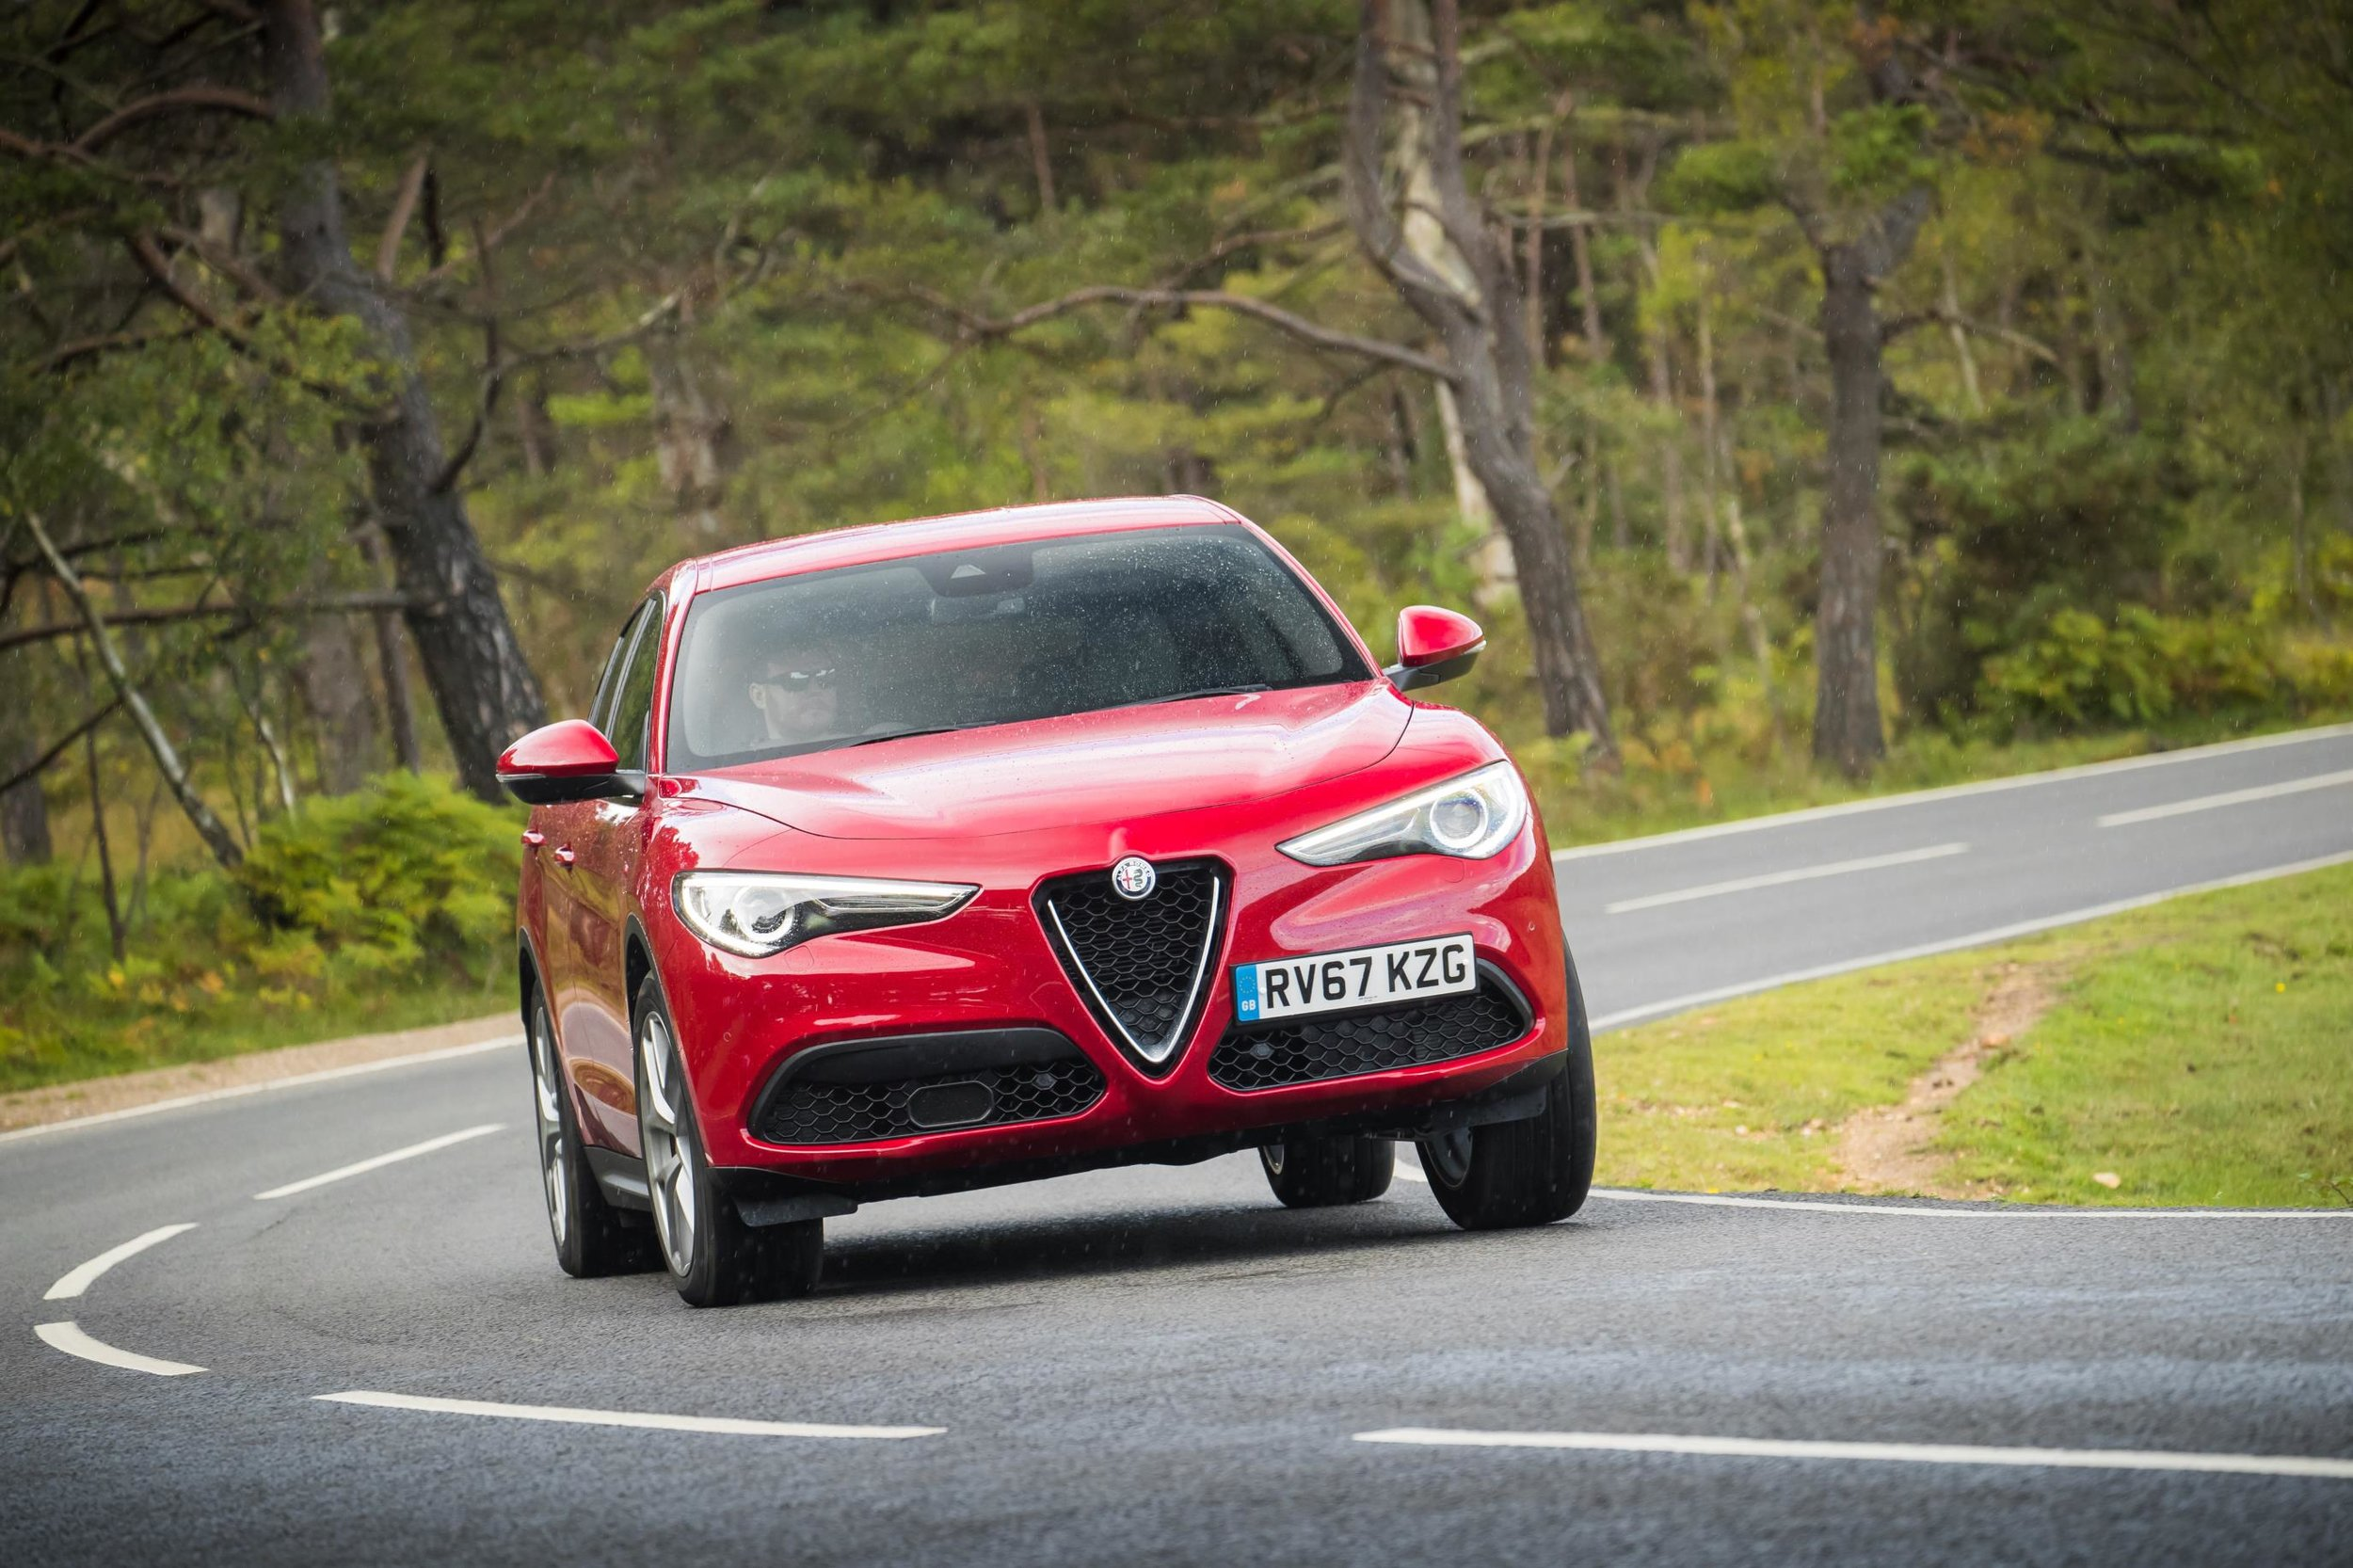 Alfa-Romeo-Stelvio-034.jpg